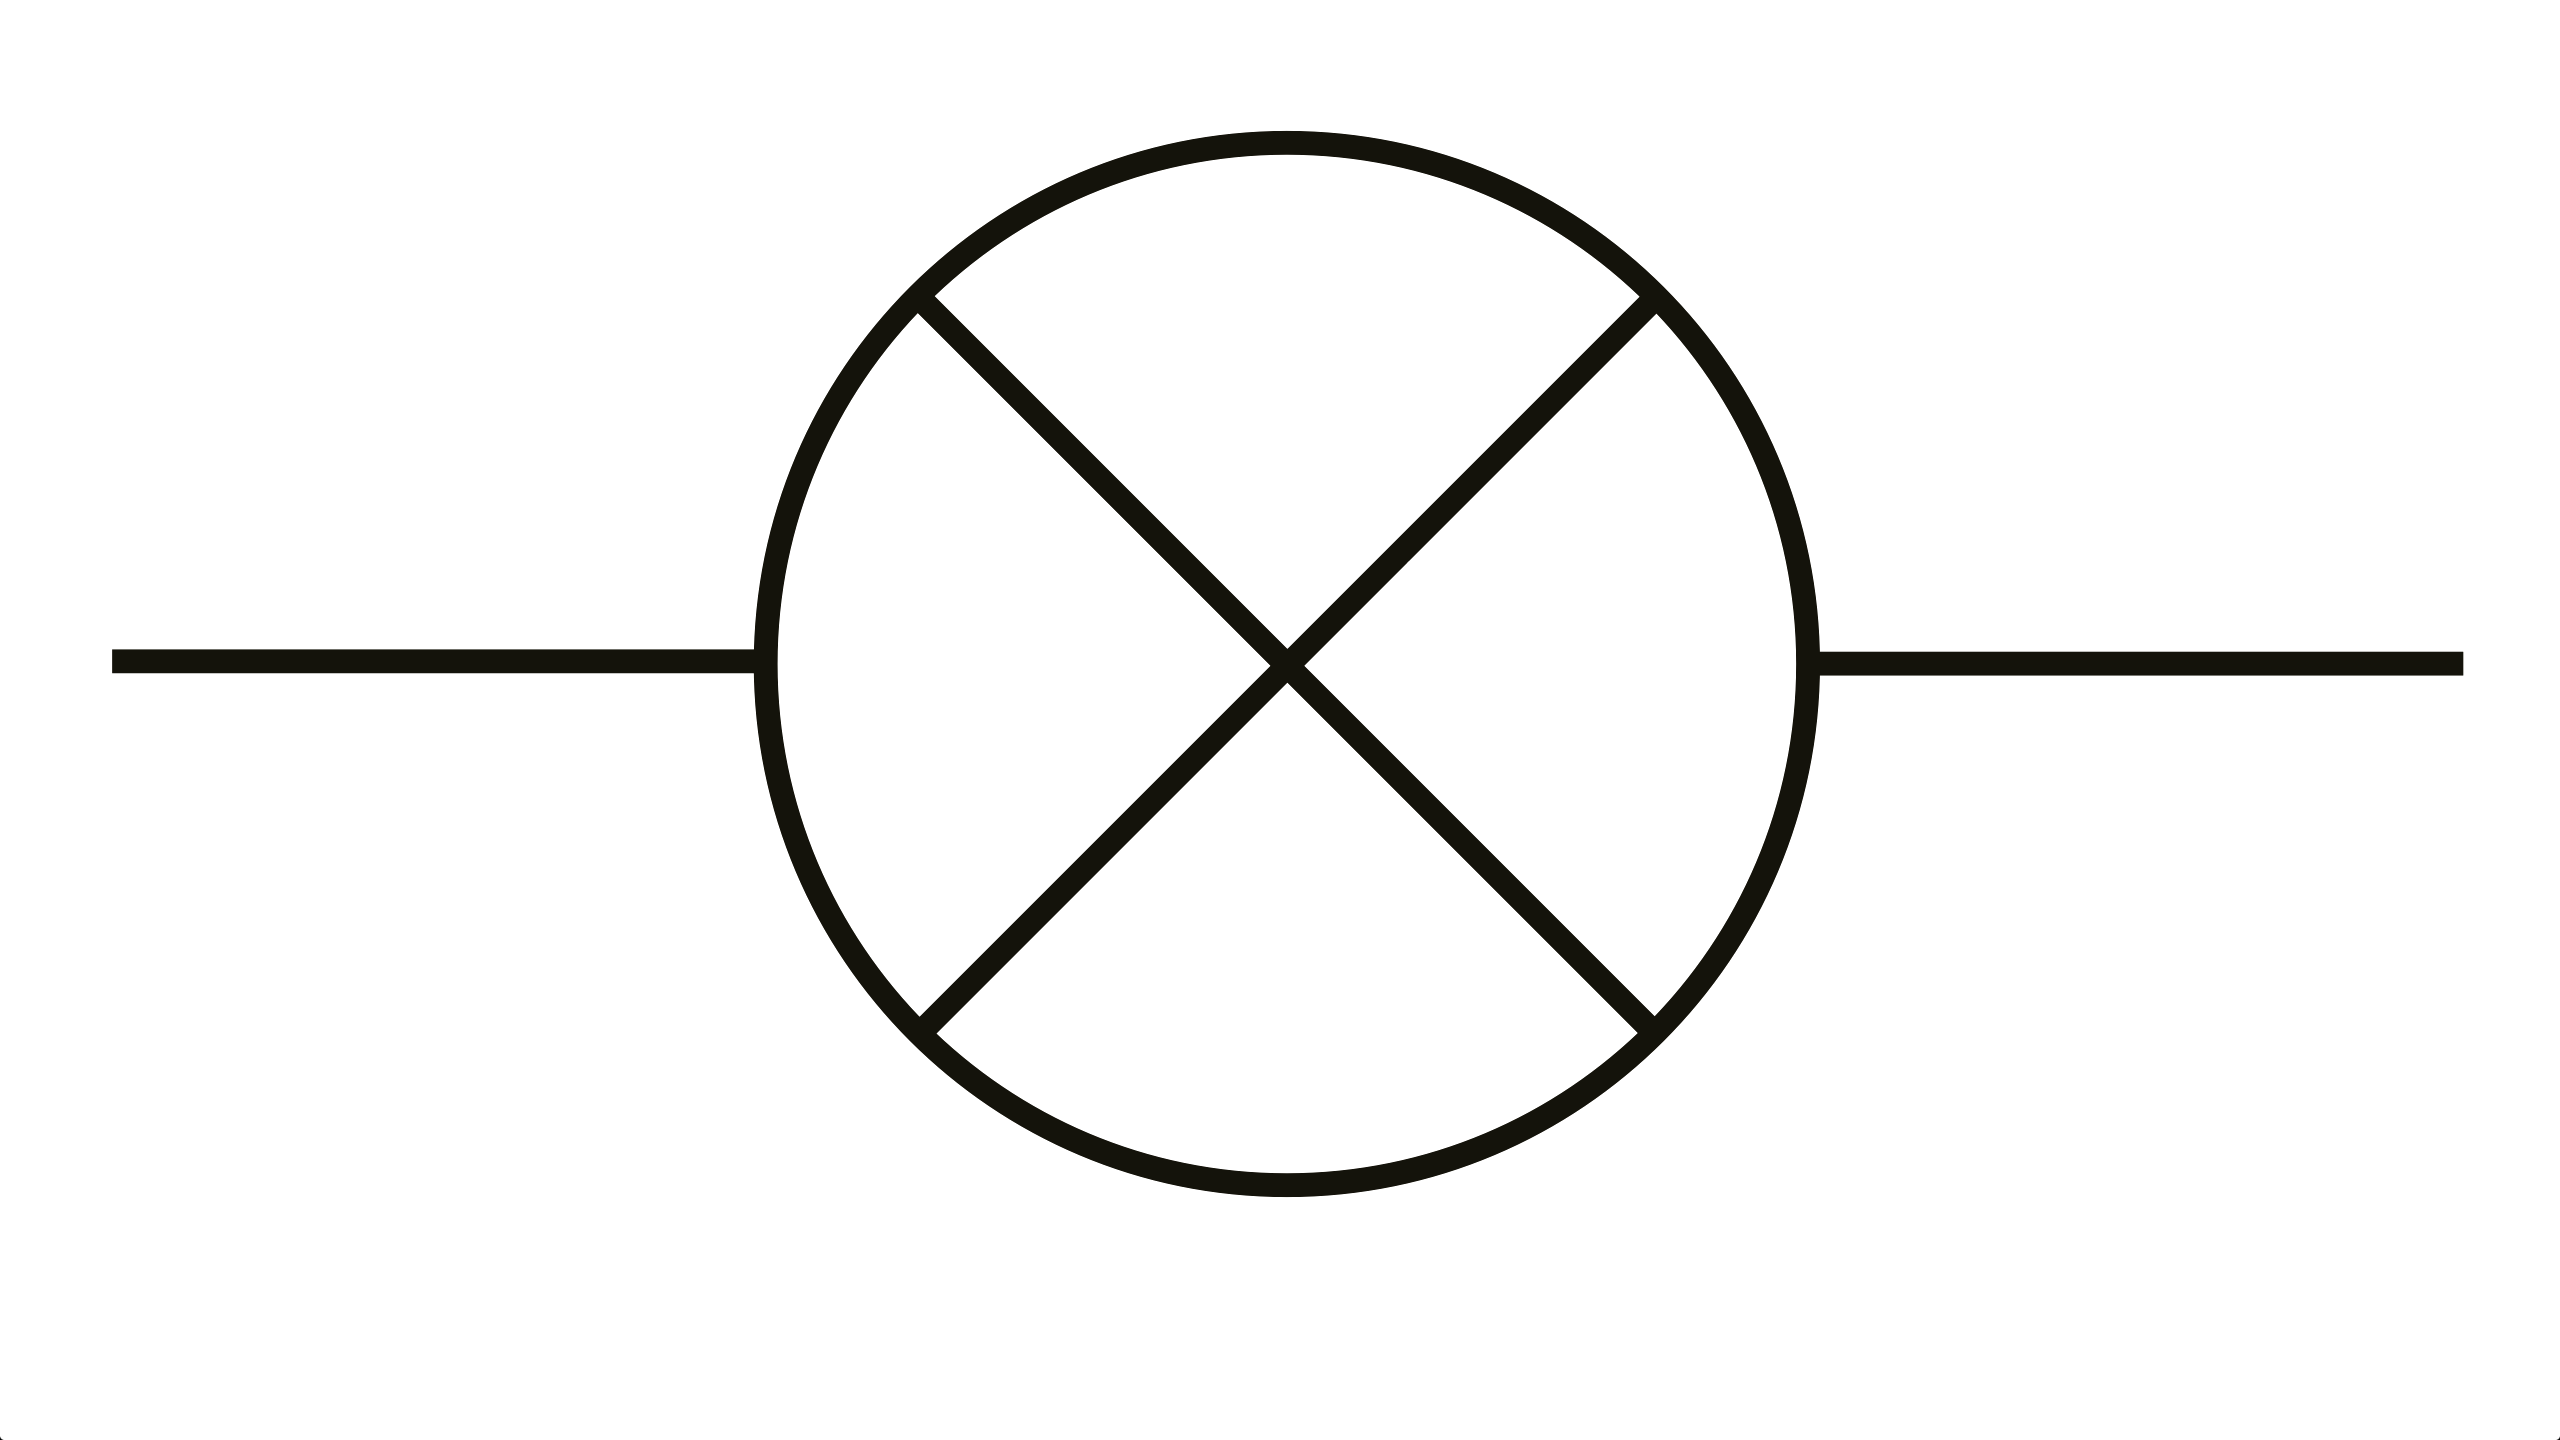 Component. symbol of thermistor: Potentiometer Symbol